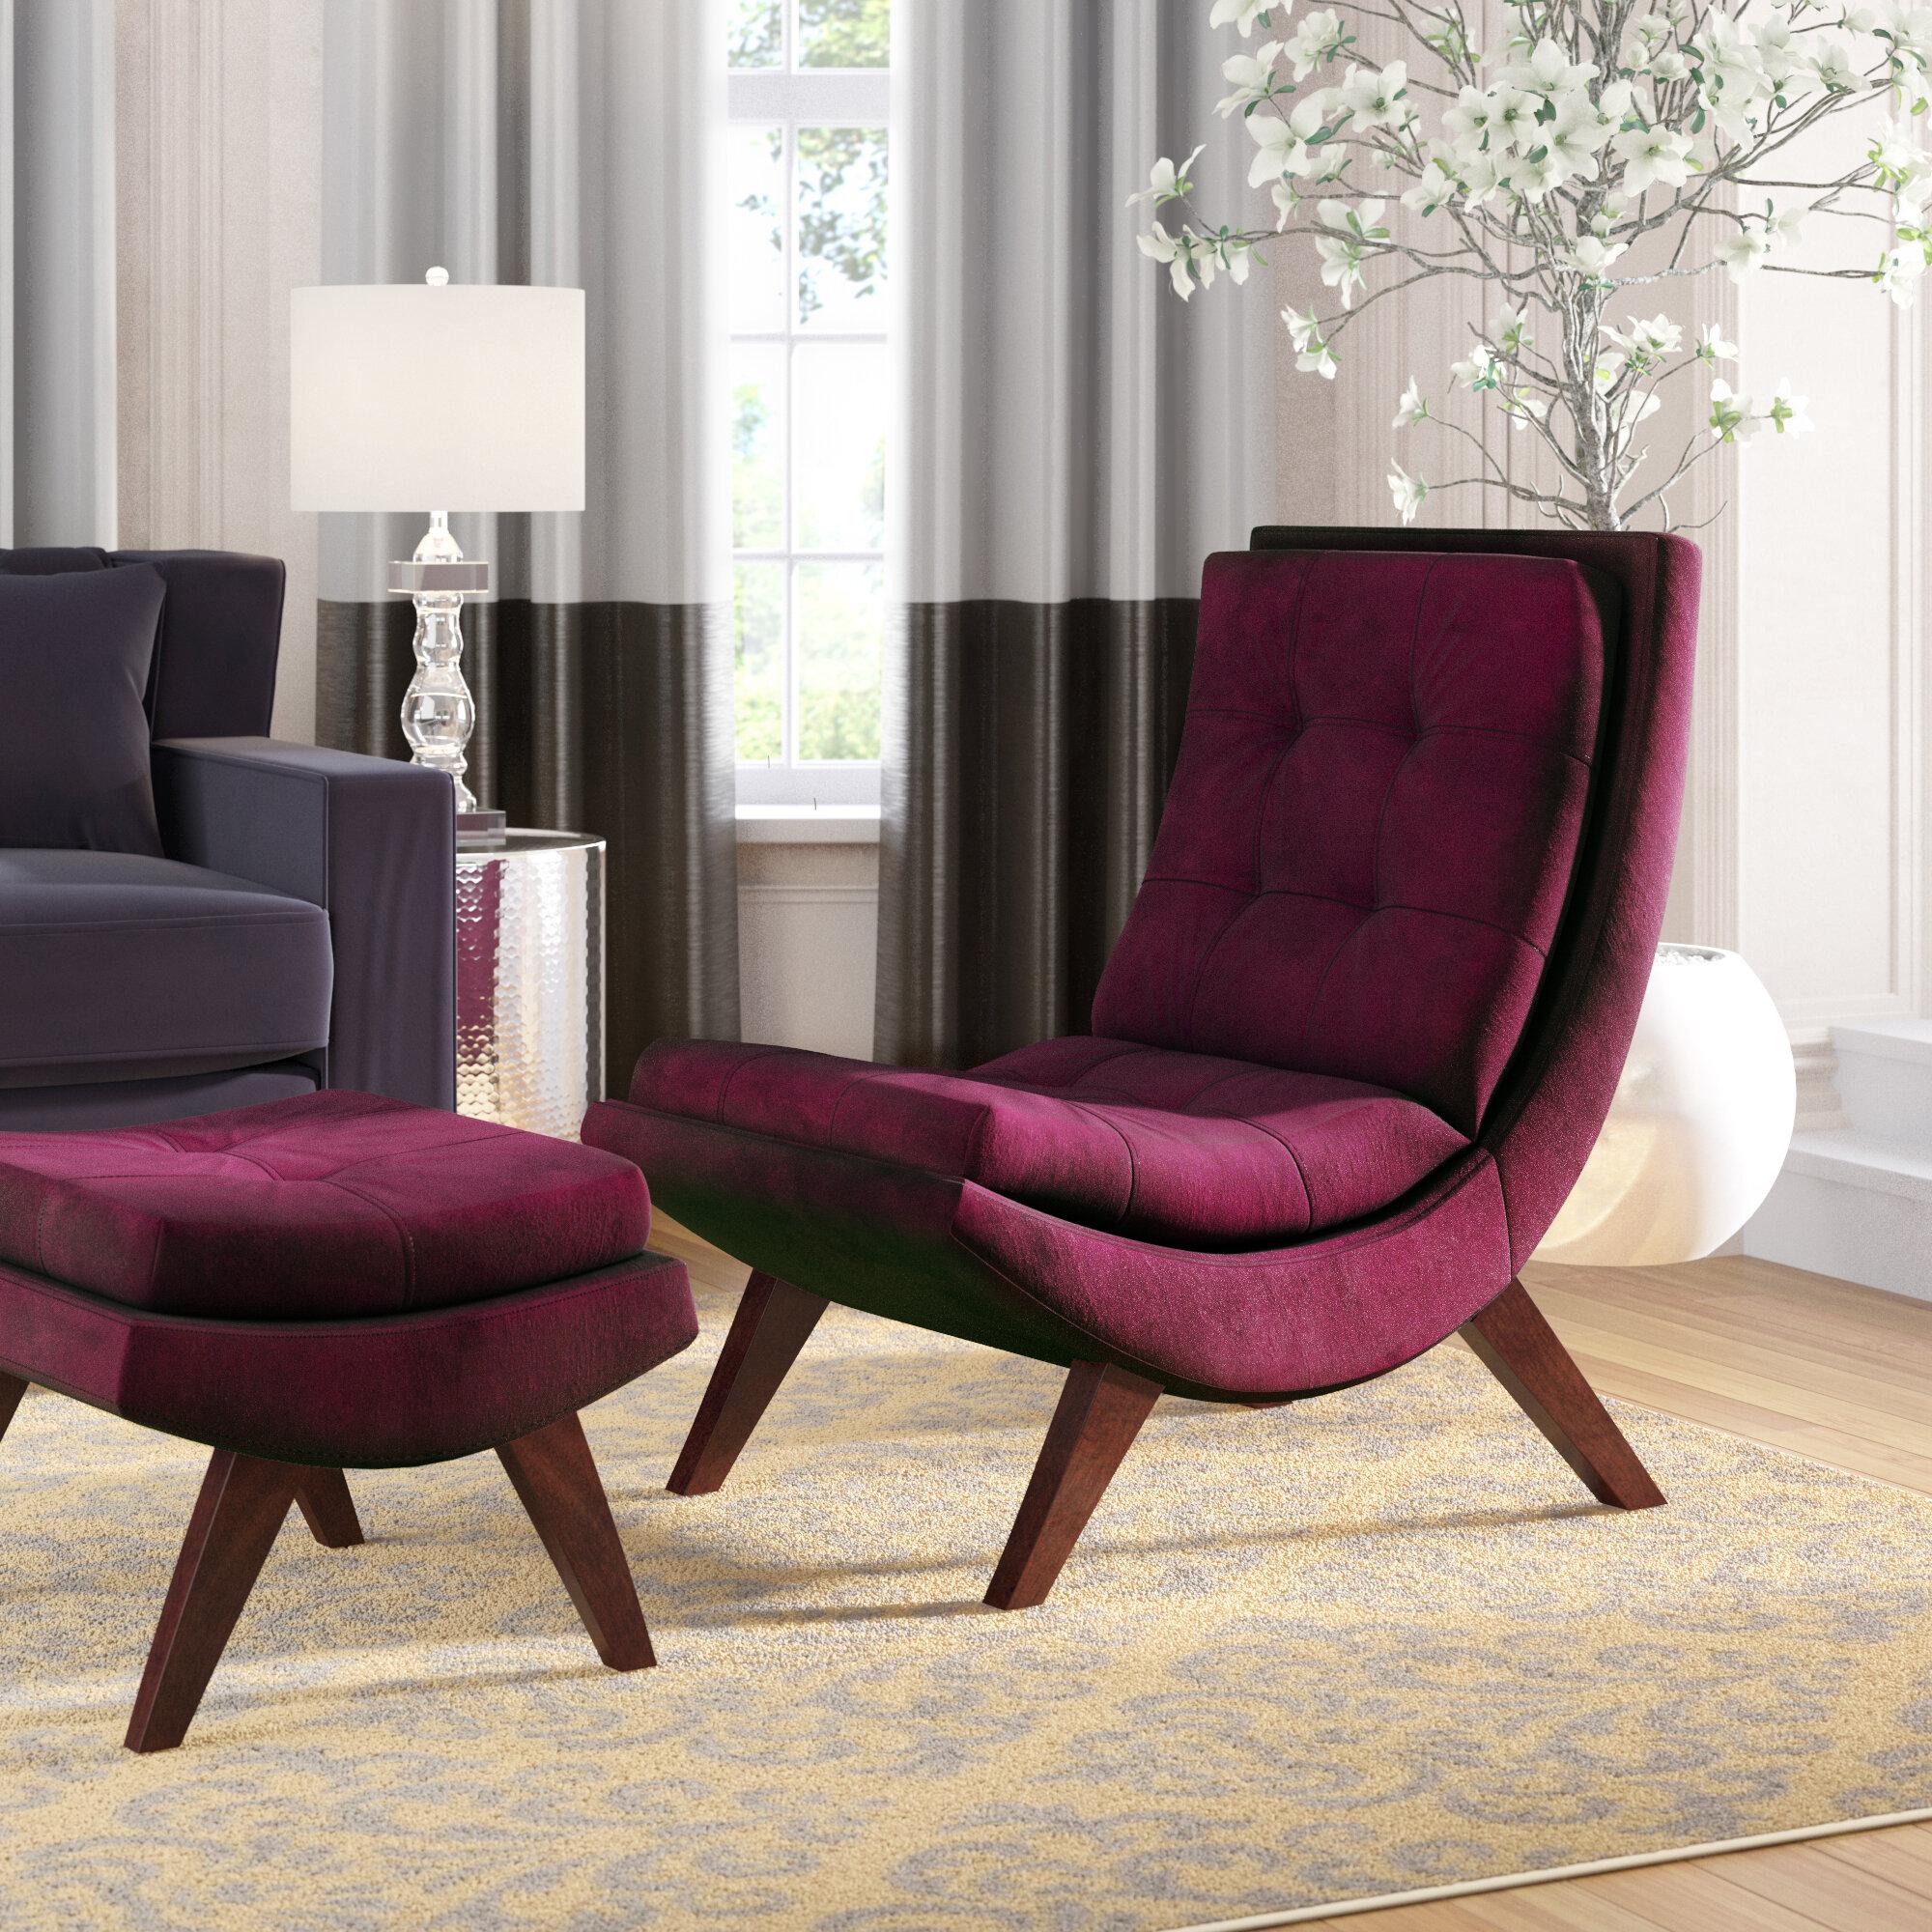 Willa Arlo Interiors Jaco Lounge Chair And Ottoman Reviews Wayfair